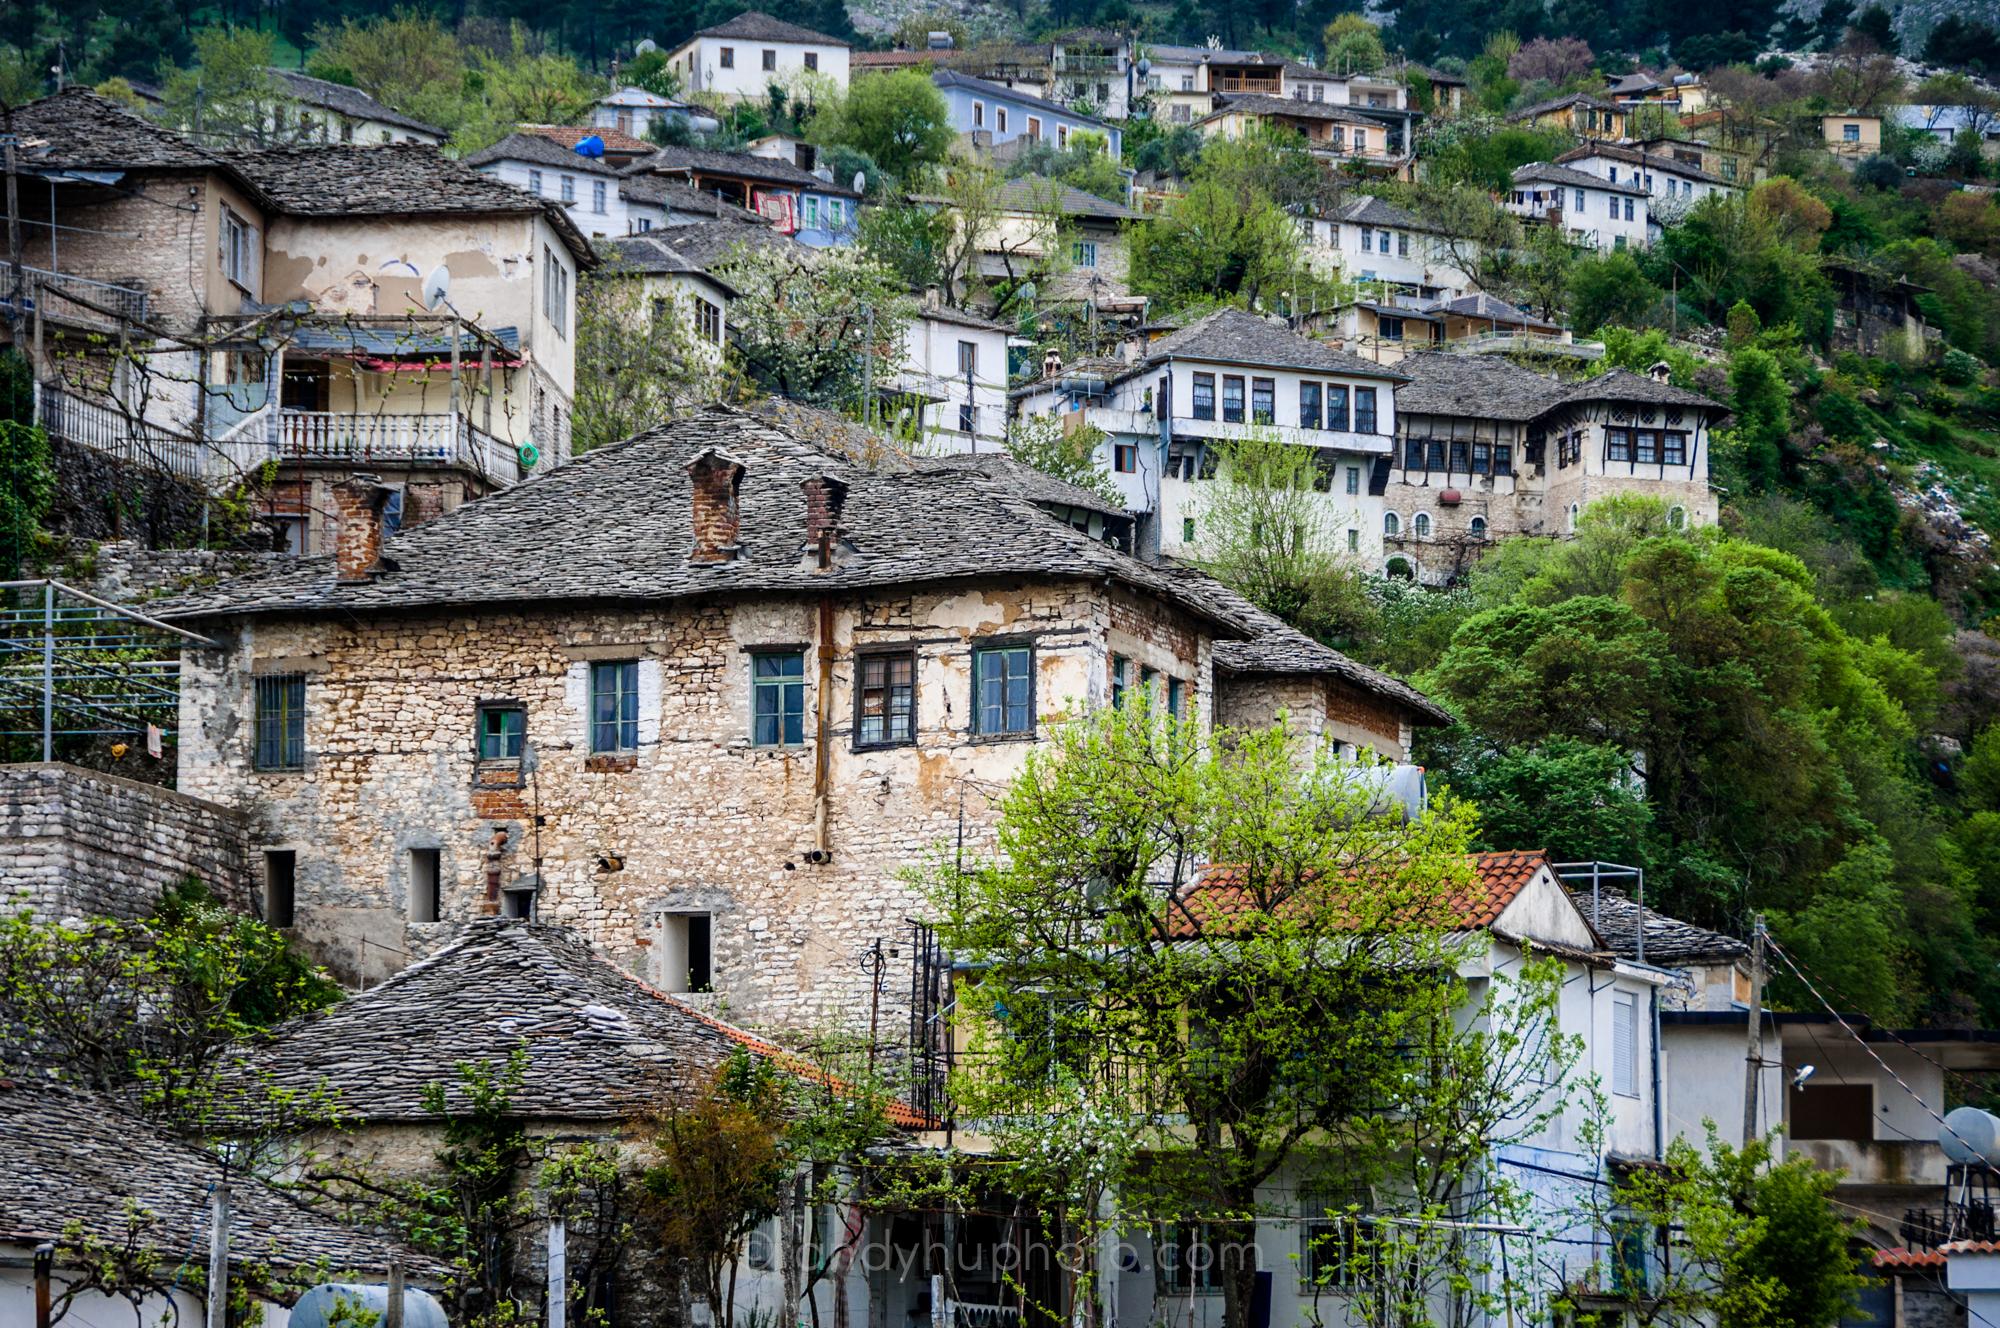 Stone houses, stone walls, stone chimneys